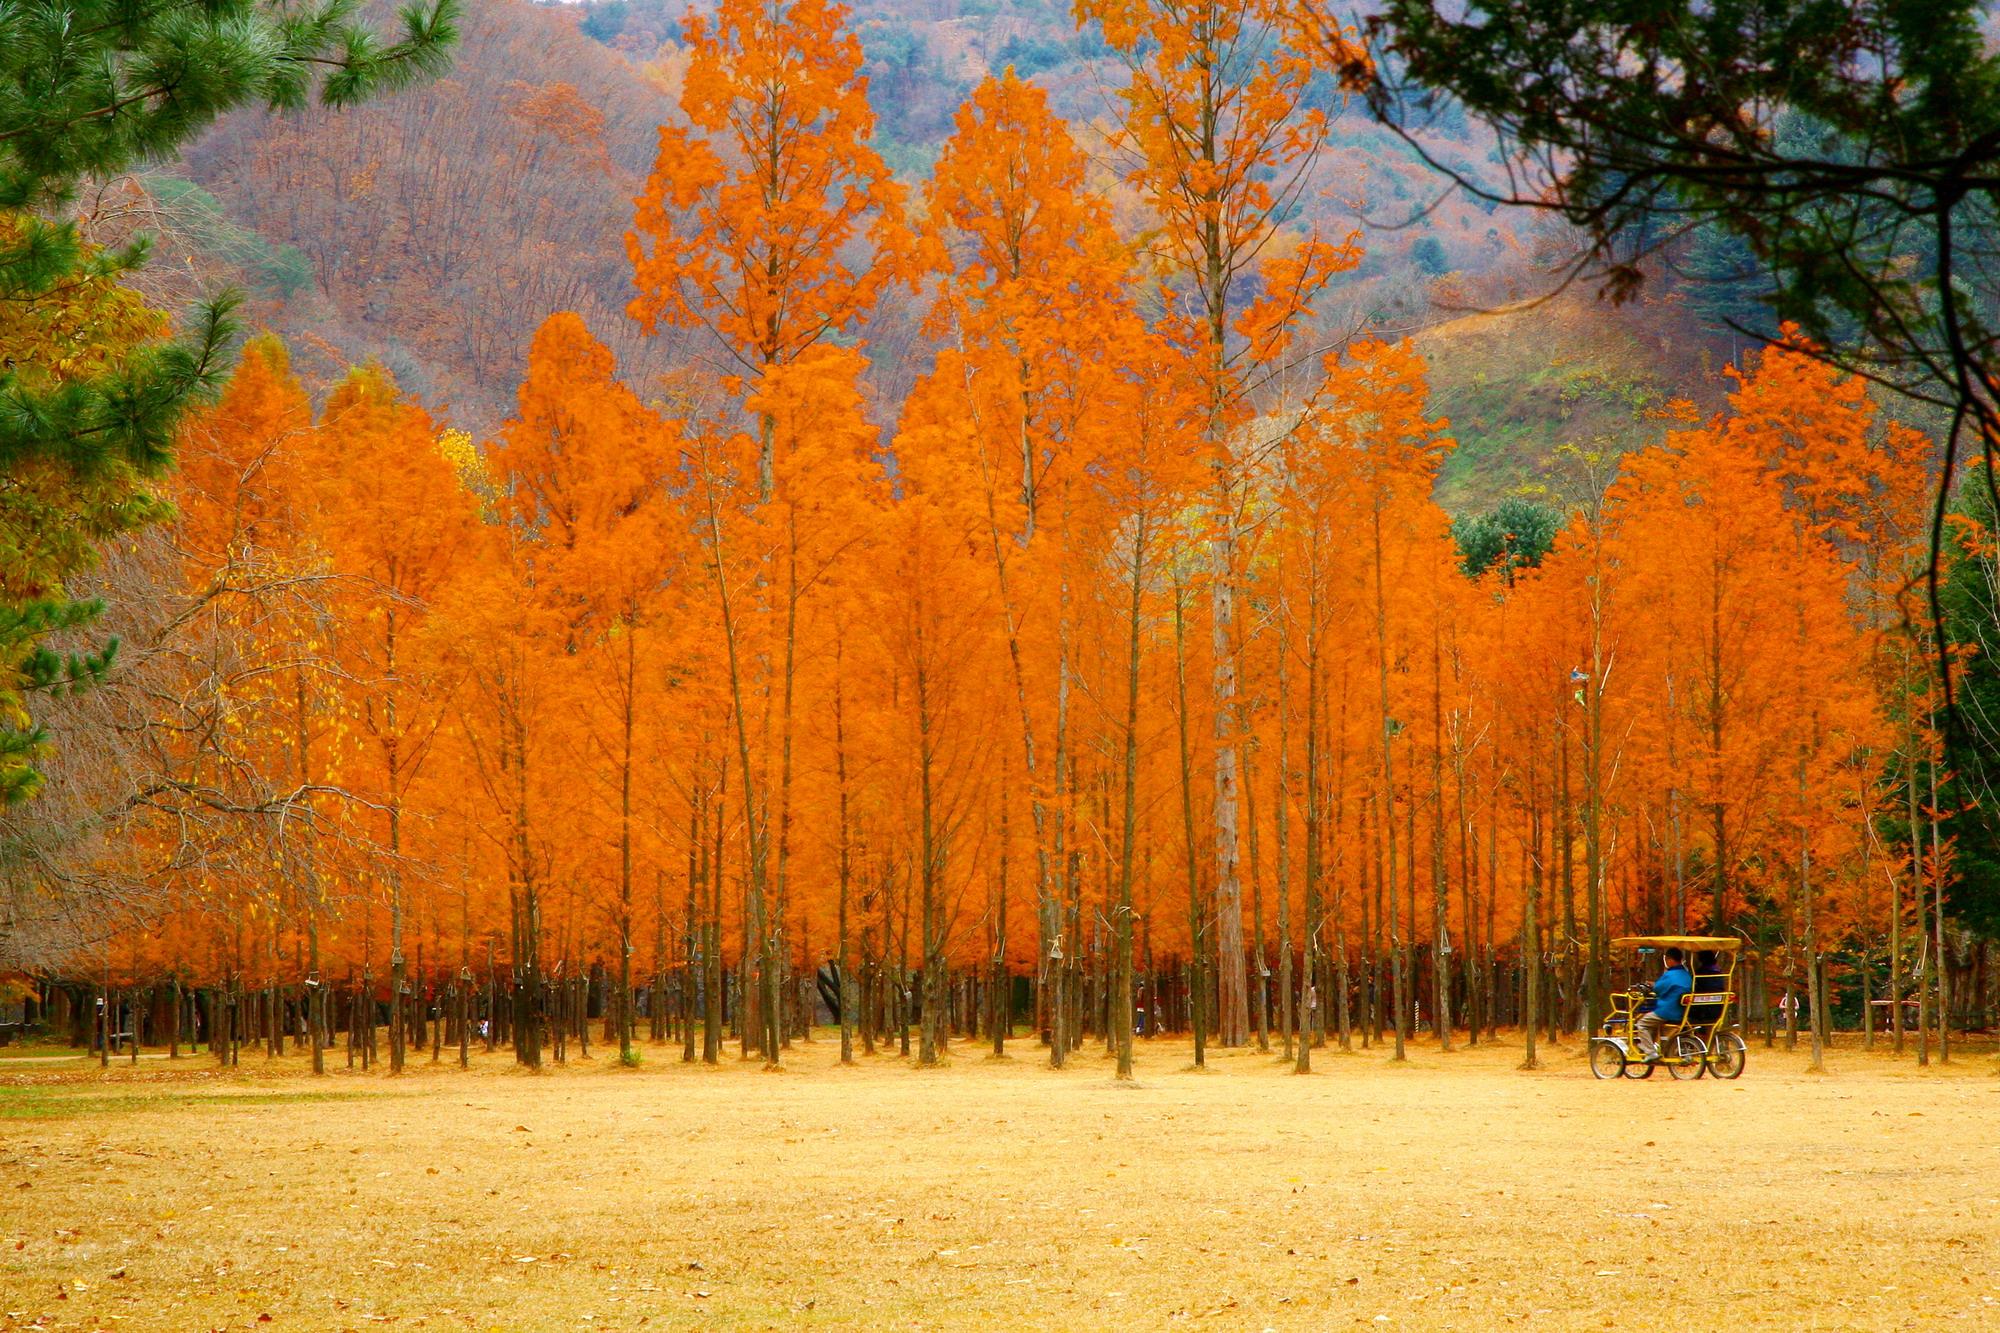 mùa săn lá đỏ bắc á